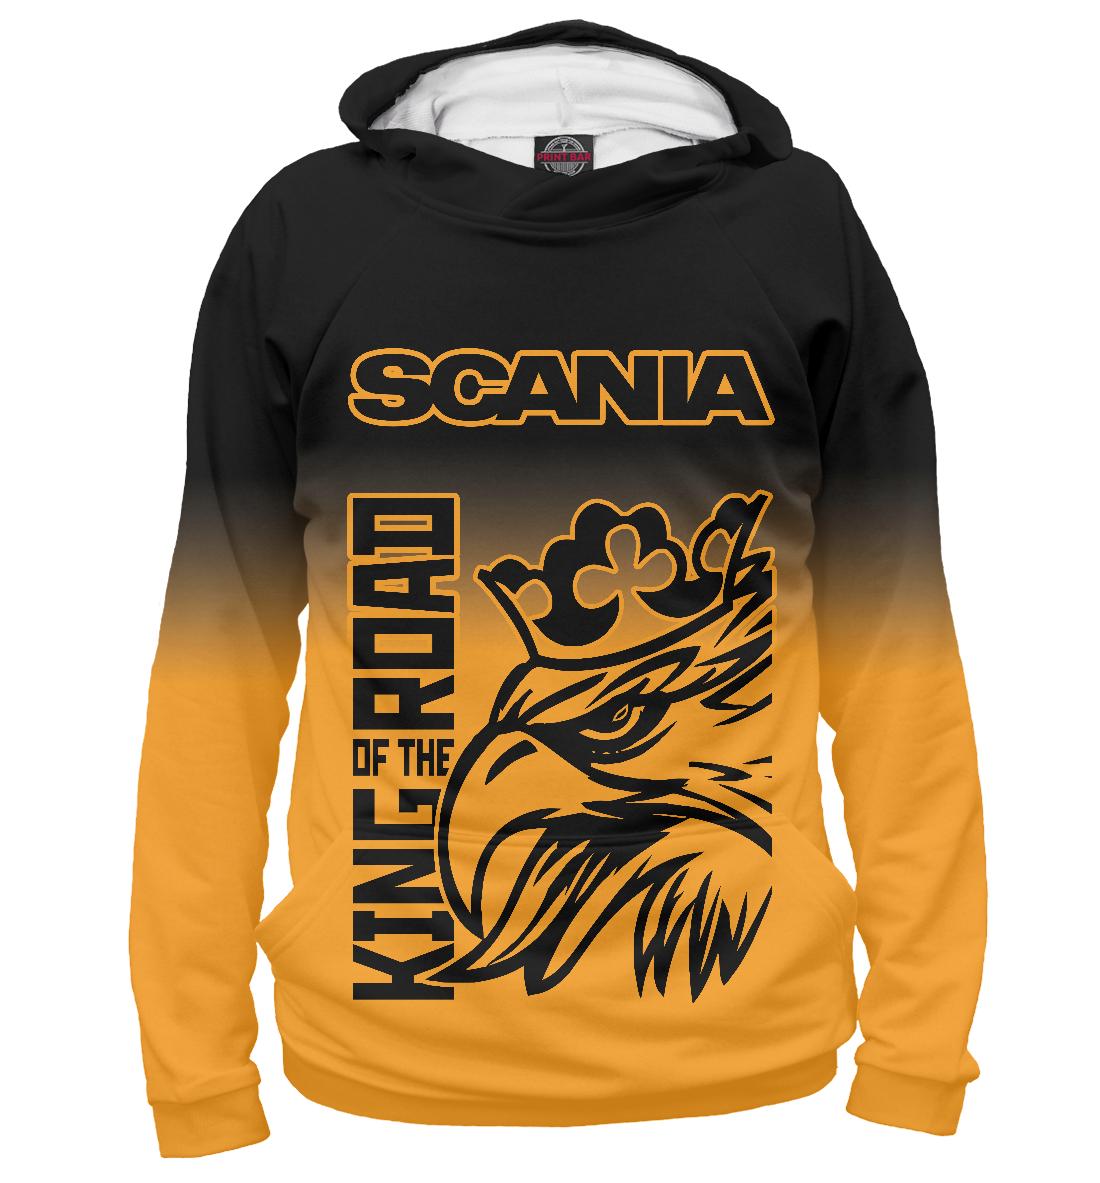 Купить SCANIA - King Of The Road, Printbar, Худи, GRZ-215981-hud-2